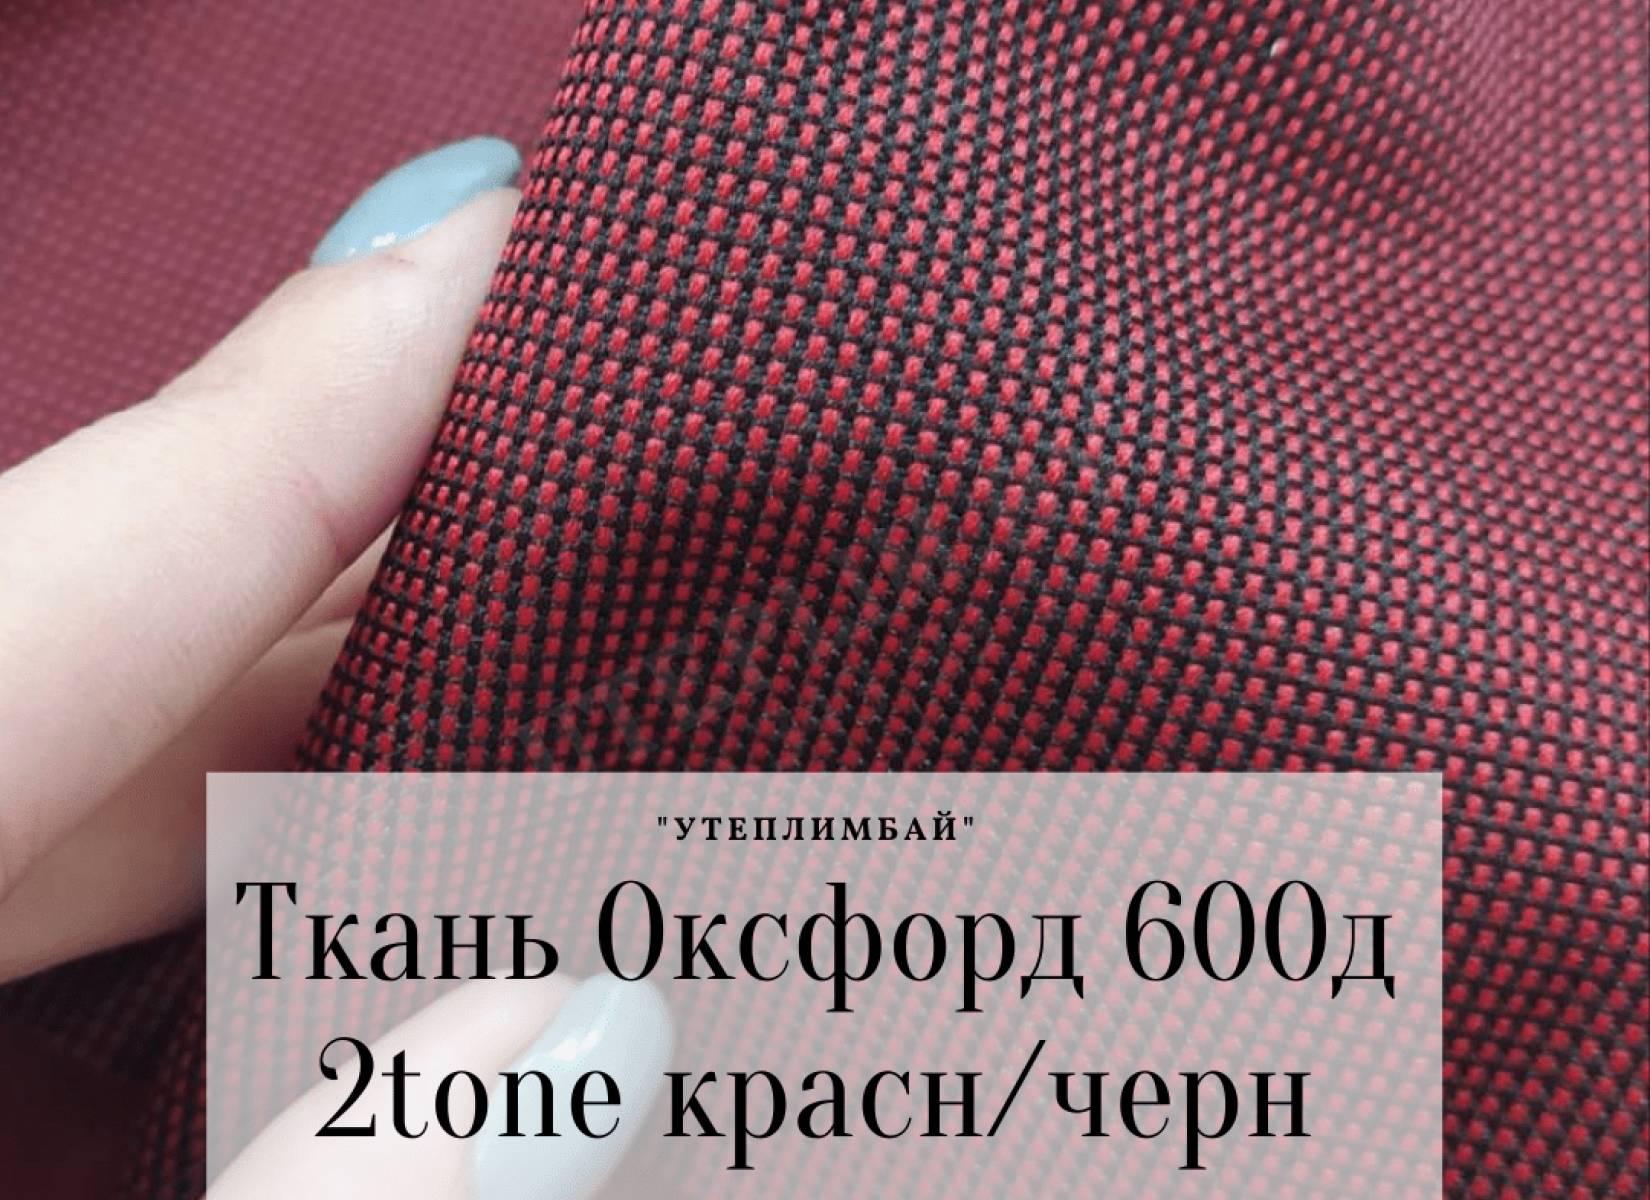 600д 2tone - красн/черн